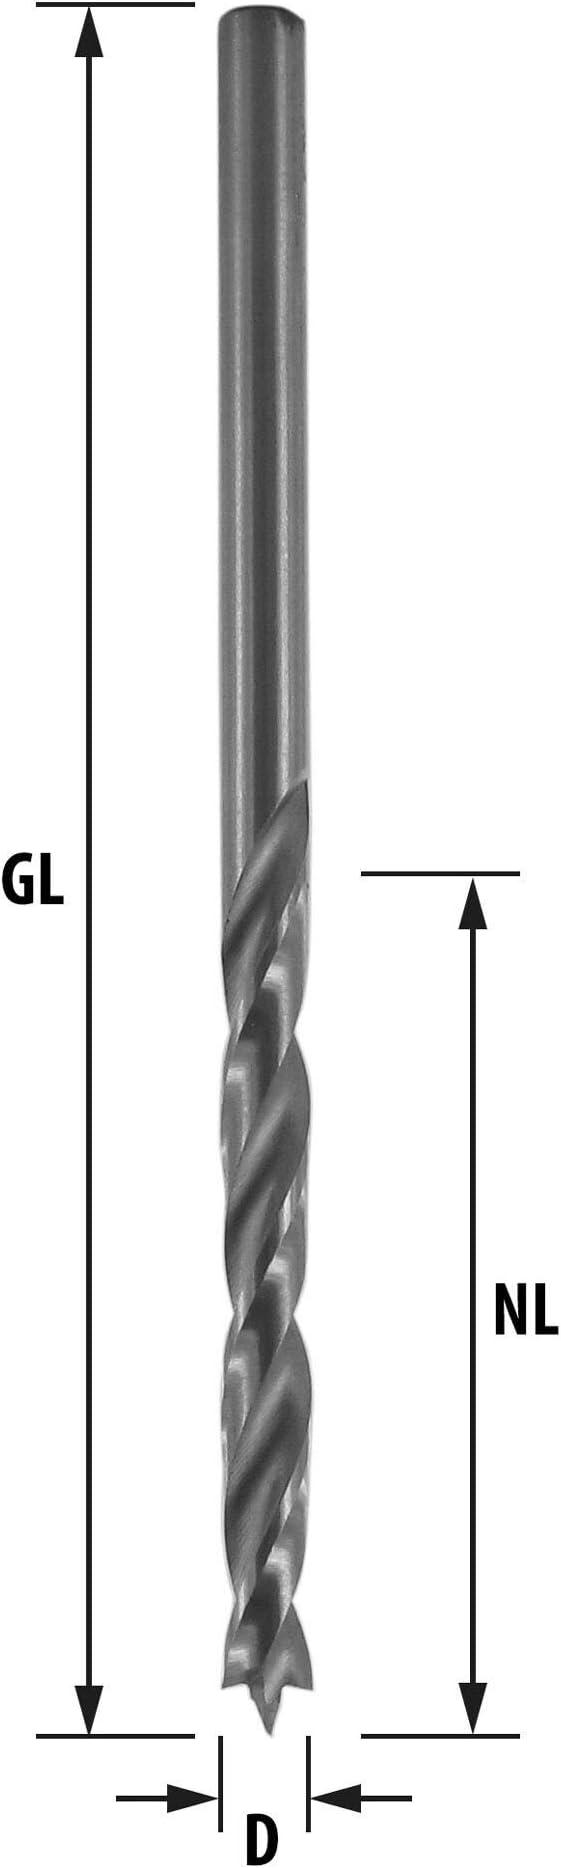 blanke Ausf/ührung Profilgeschliffen Jeco Spiralbohrer Bohrer /Ø 0,5 mm HSS-G 10 St/ück DIN 338 N